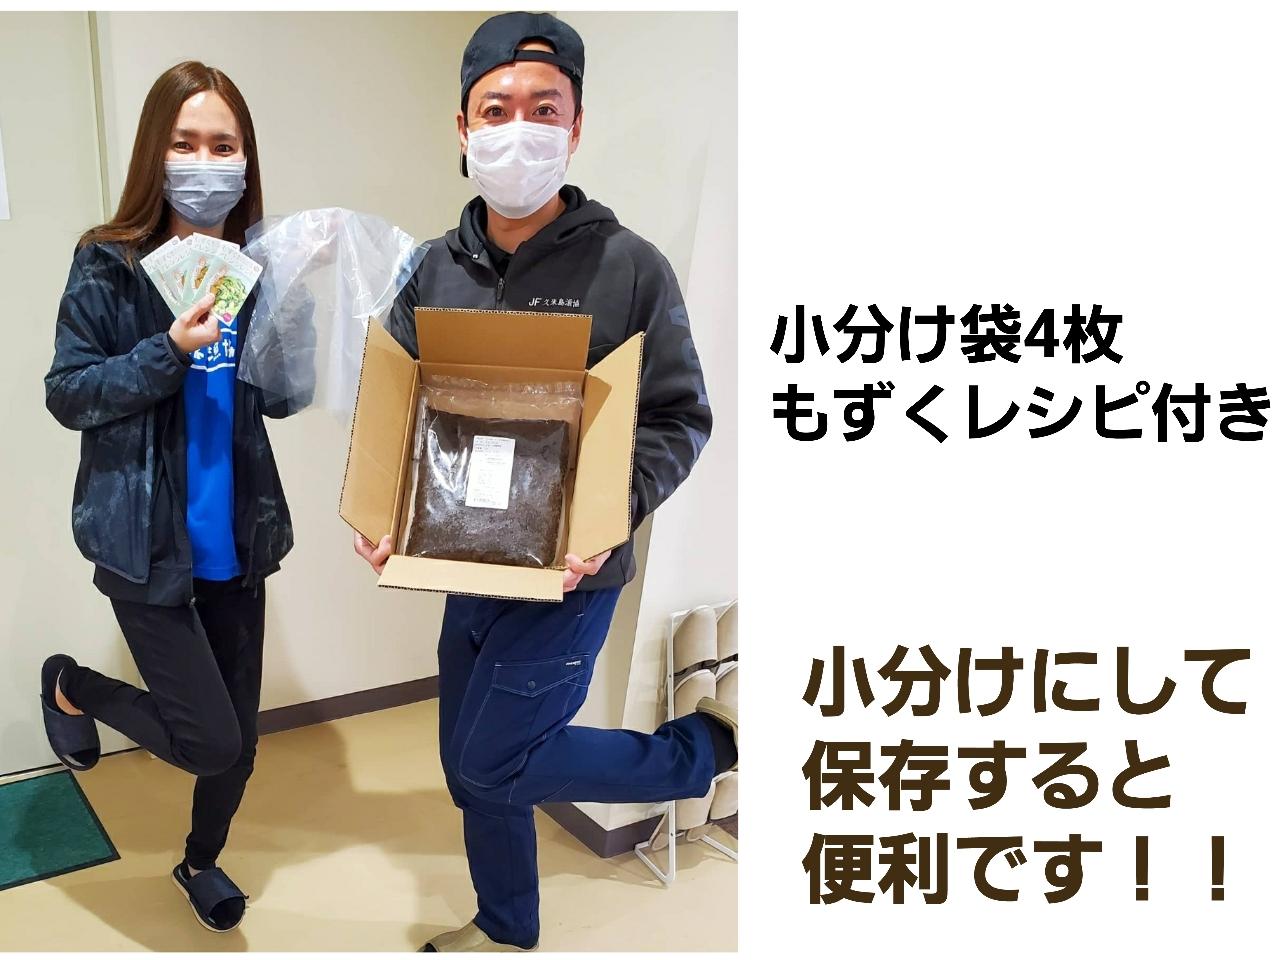 item_mizuagemozuku_01